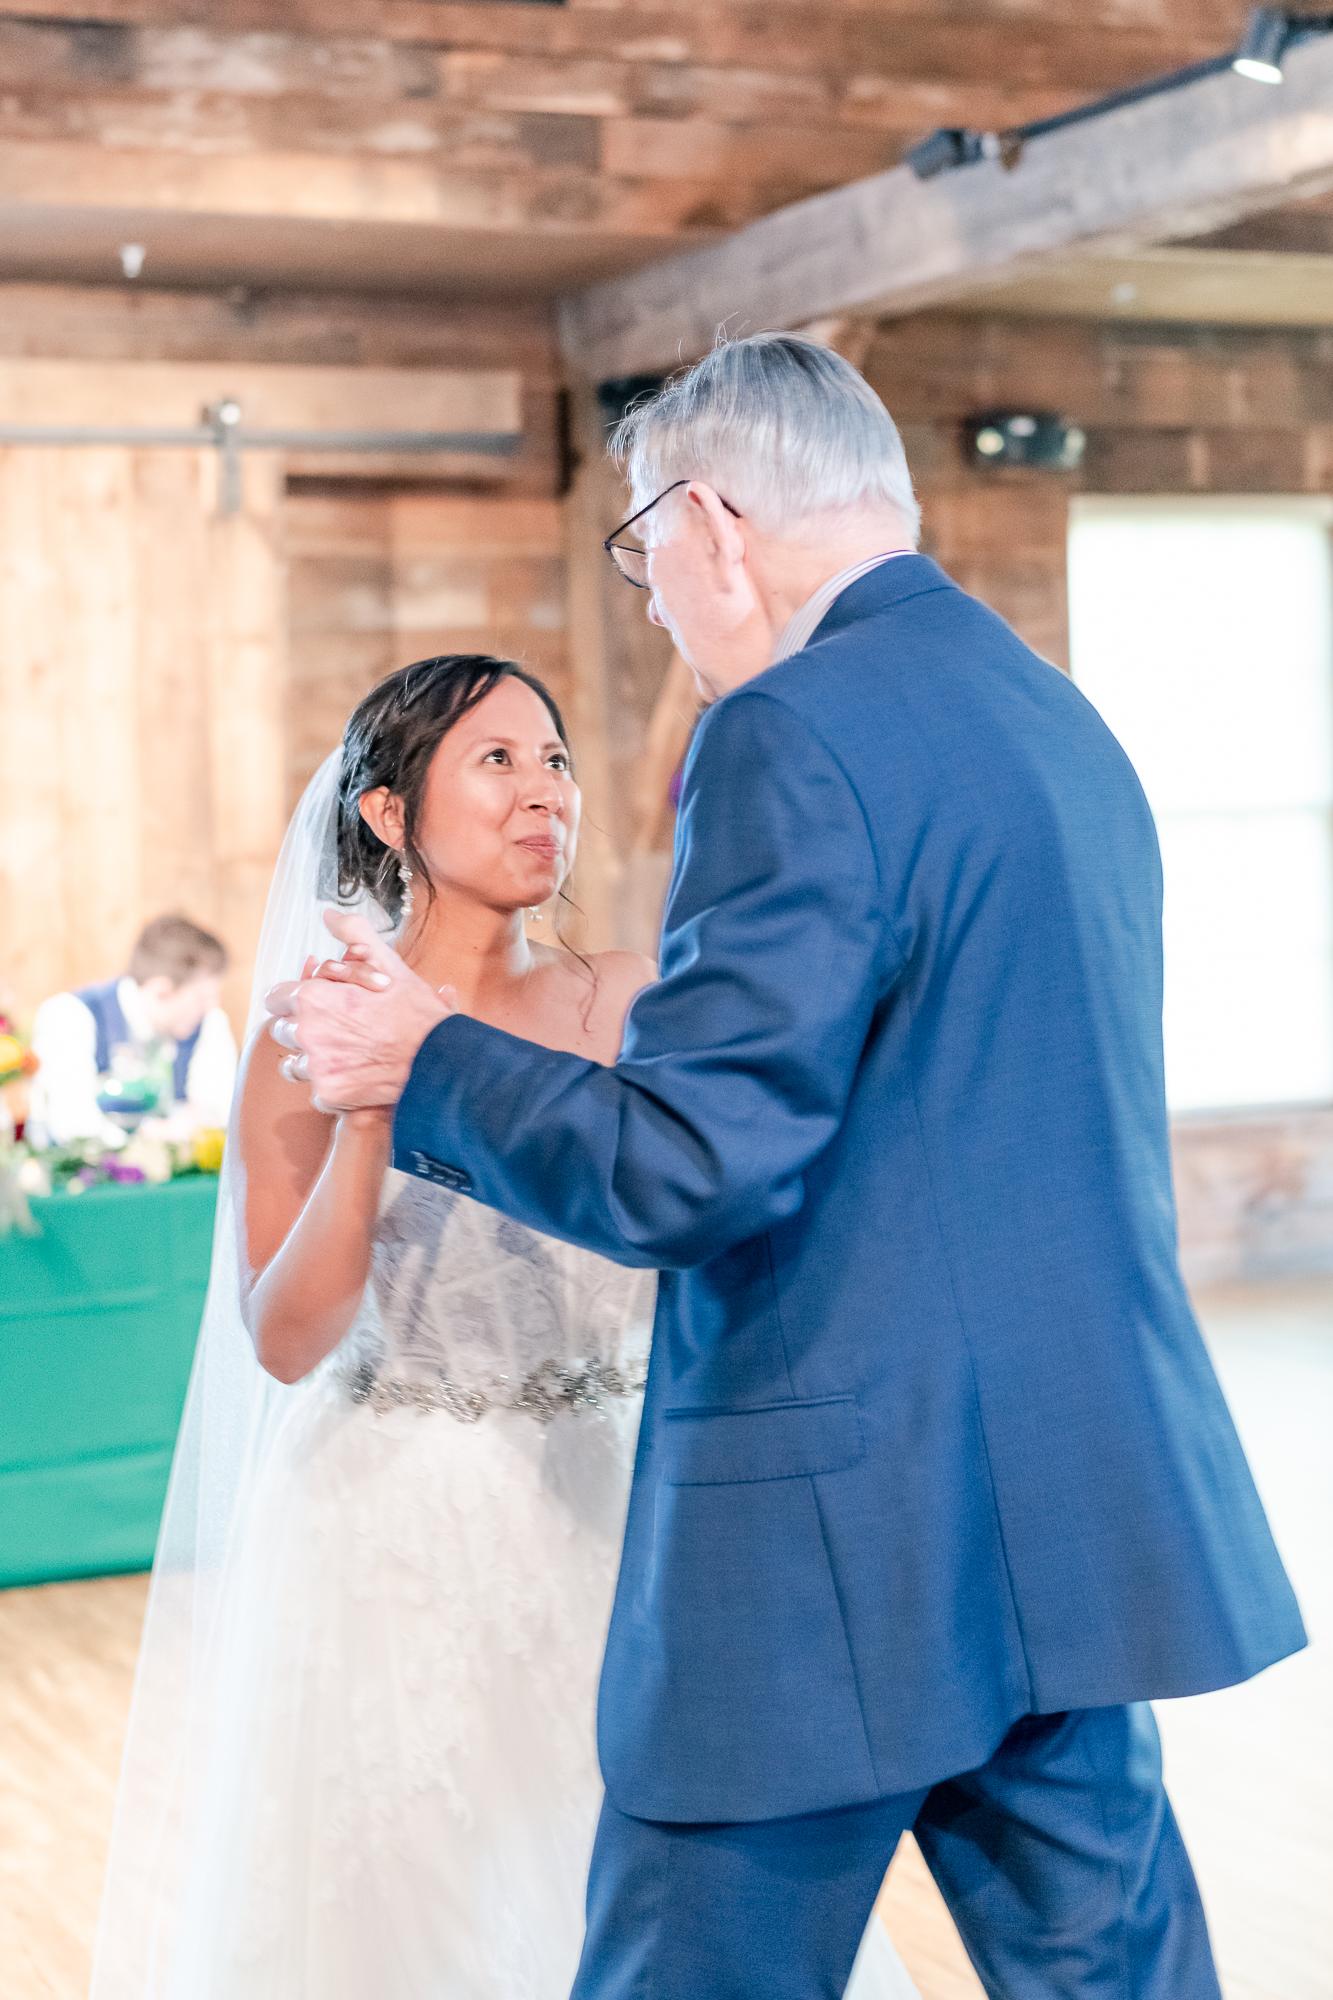 Maria+Adam_Summer Barn Wedding_The Barn at The North Star Preserve_Oberlin_Ohio-197.jpg